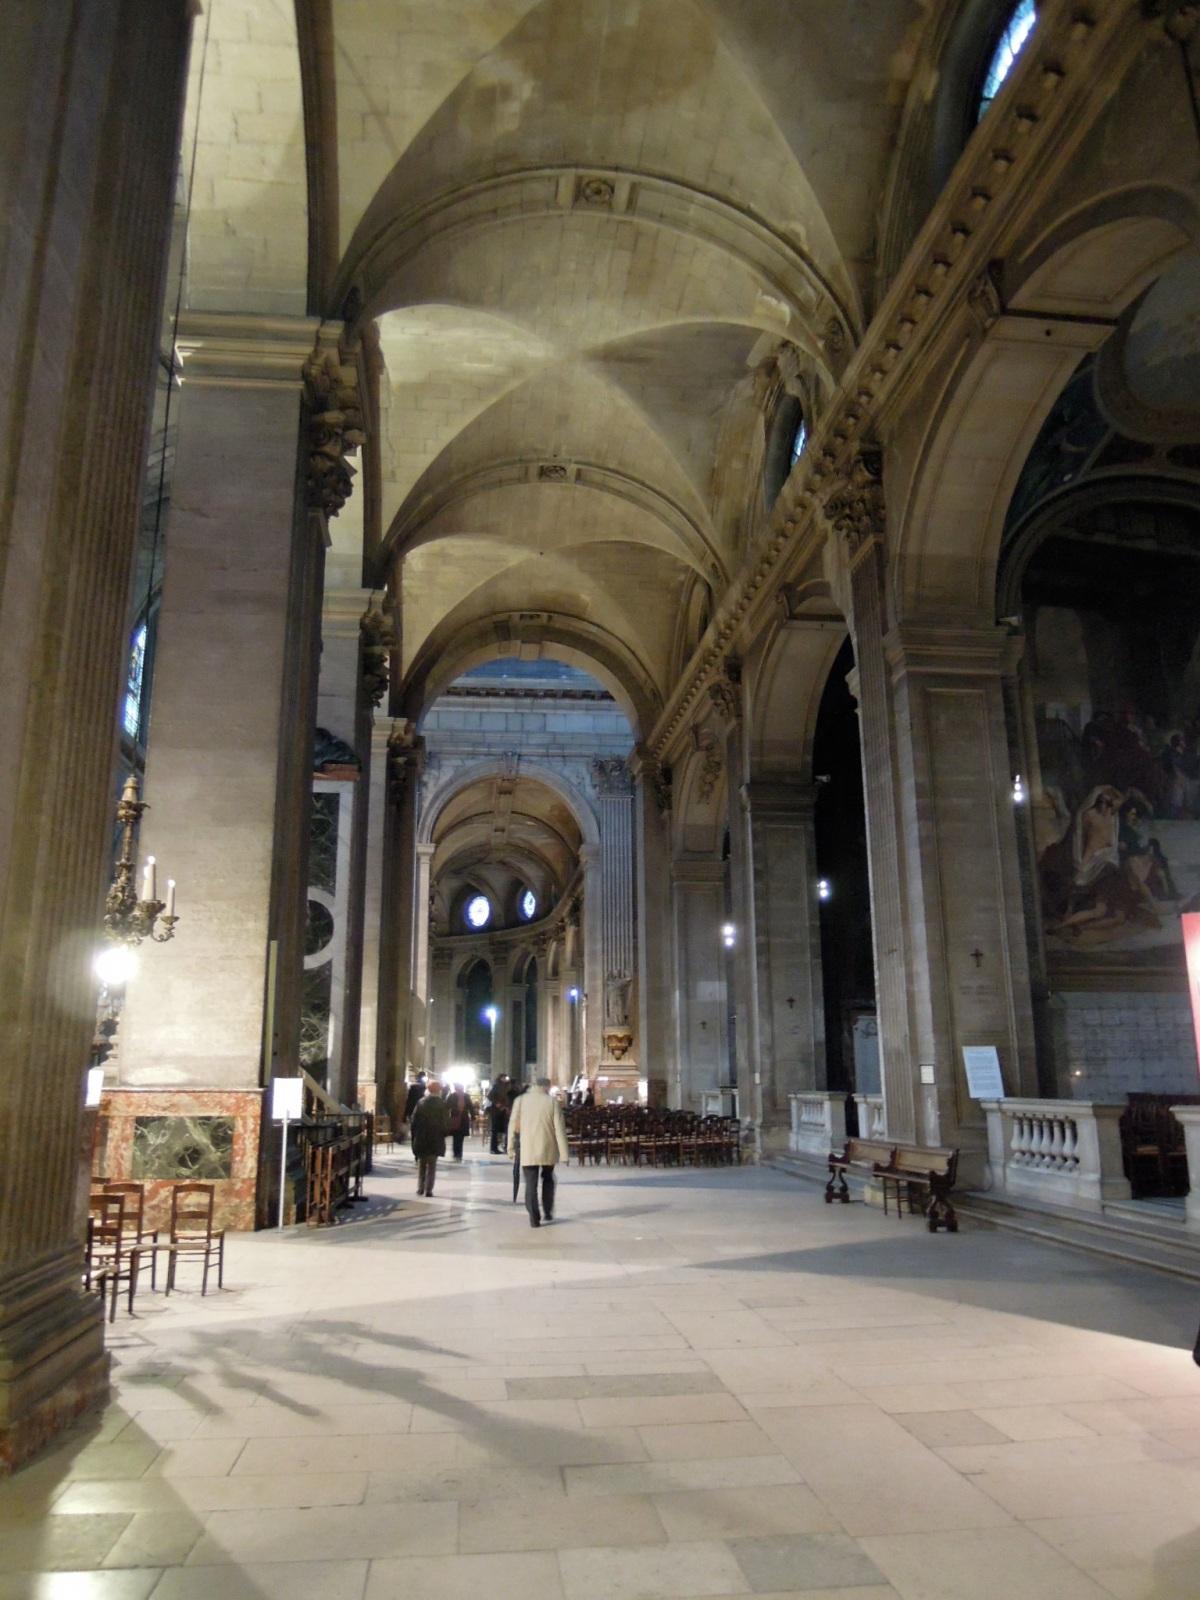 Vaulted ceilings inside Saint-Sulpice